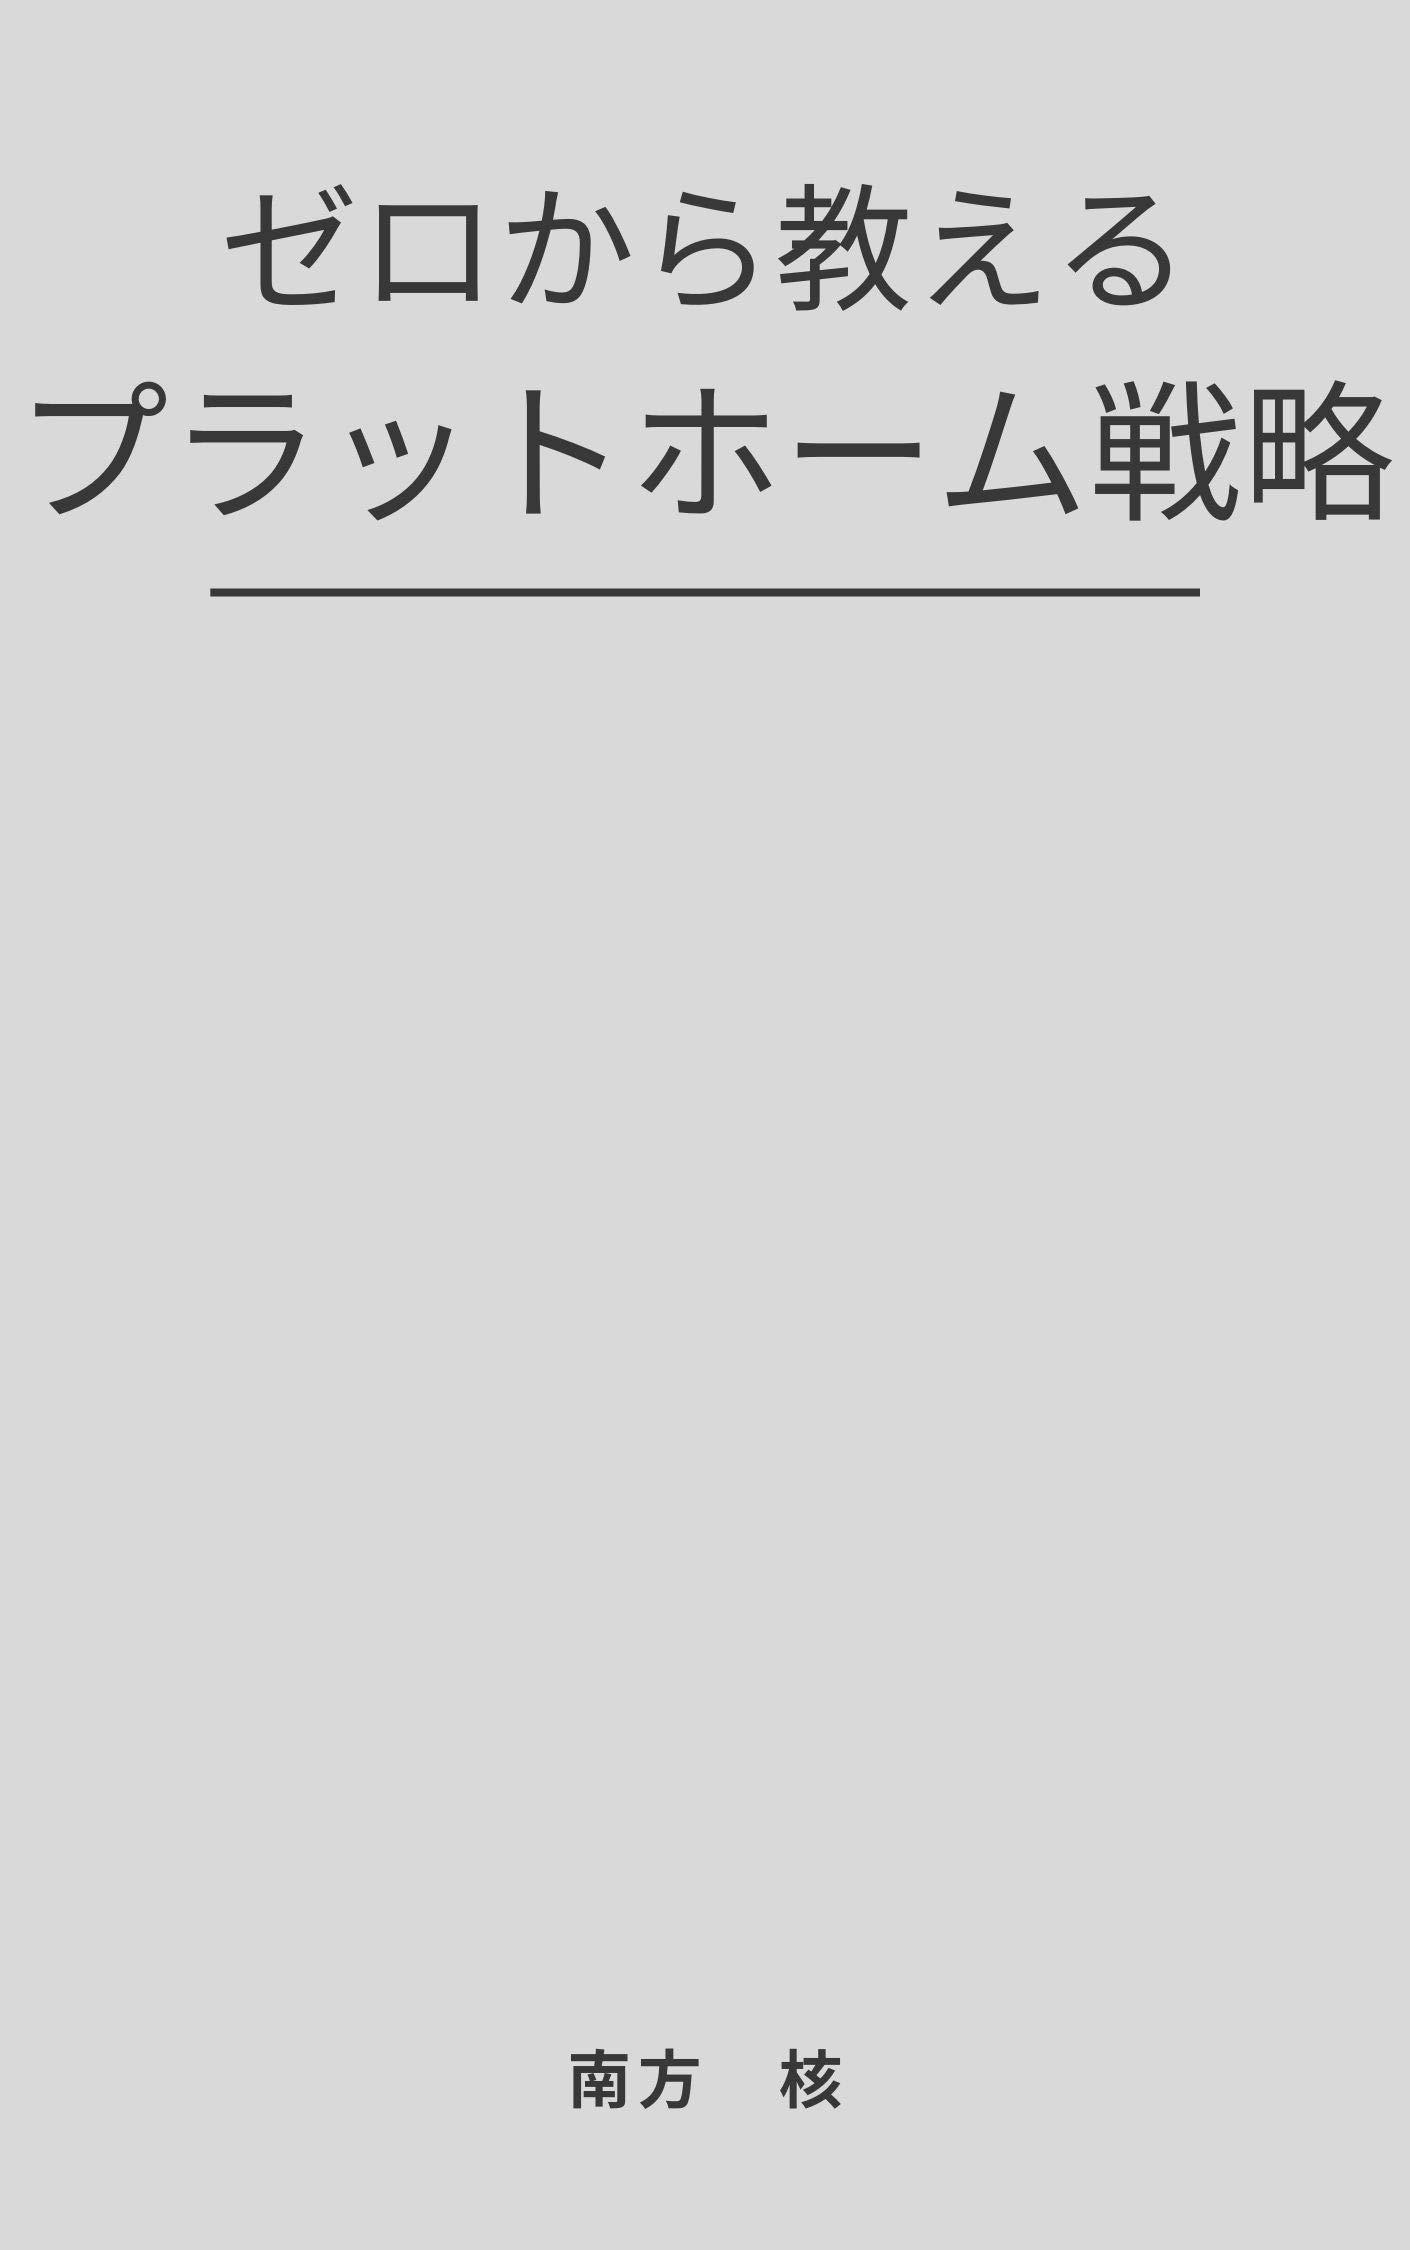 zerokaraosierupurattofomusennryaku (Japanese Edition)